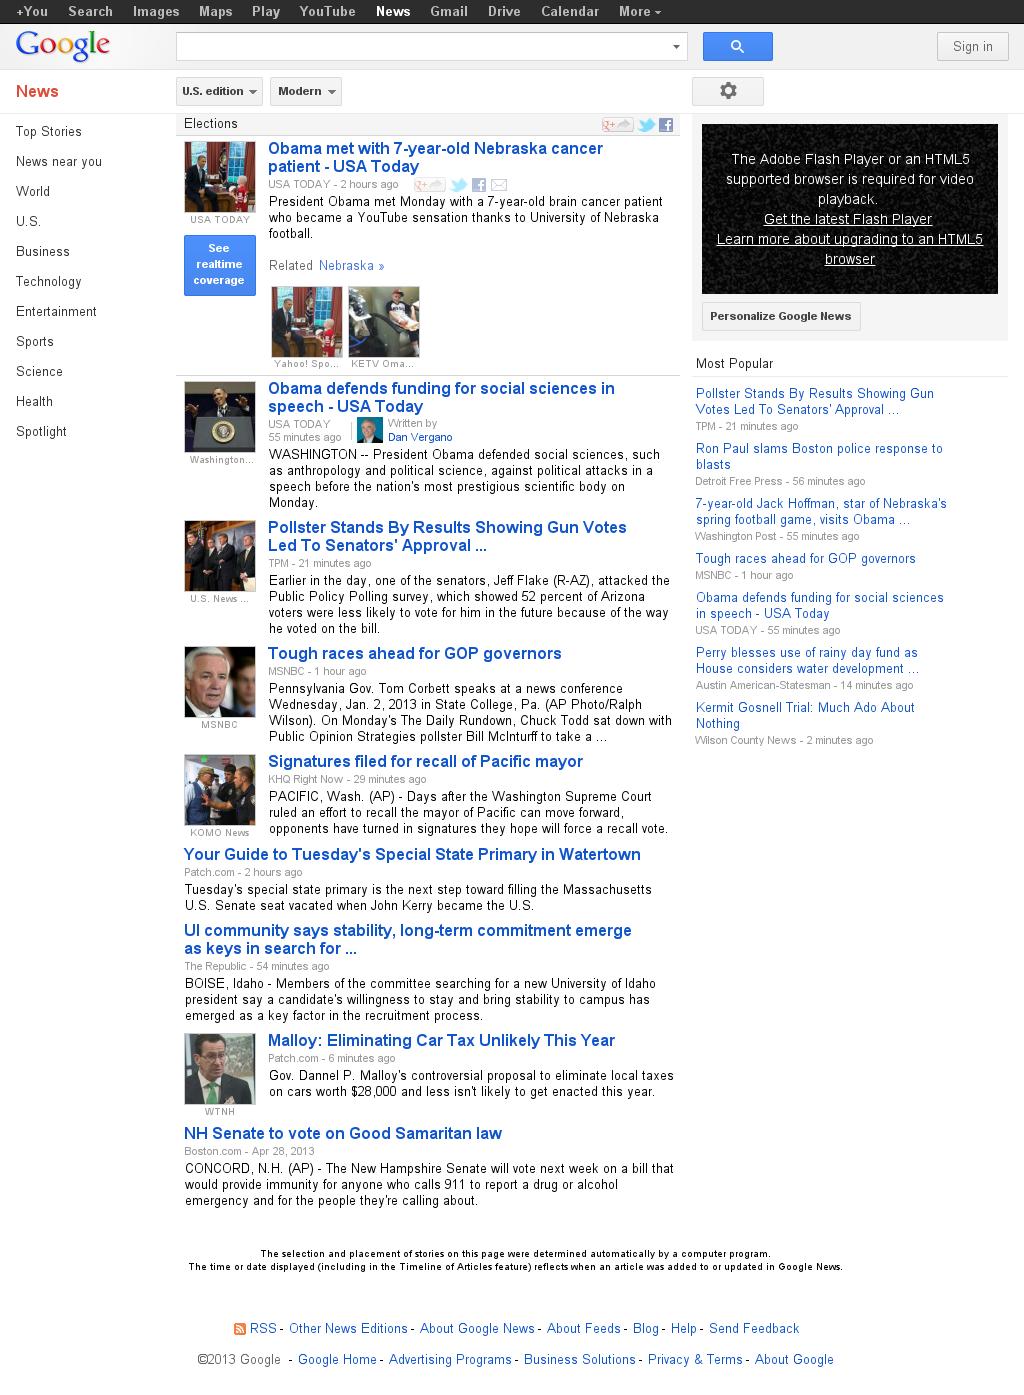 Google News: Elections at Monday April 29, 2013, 9:07 p.m. UTC